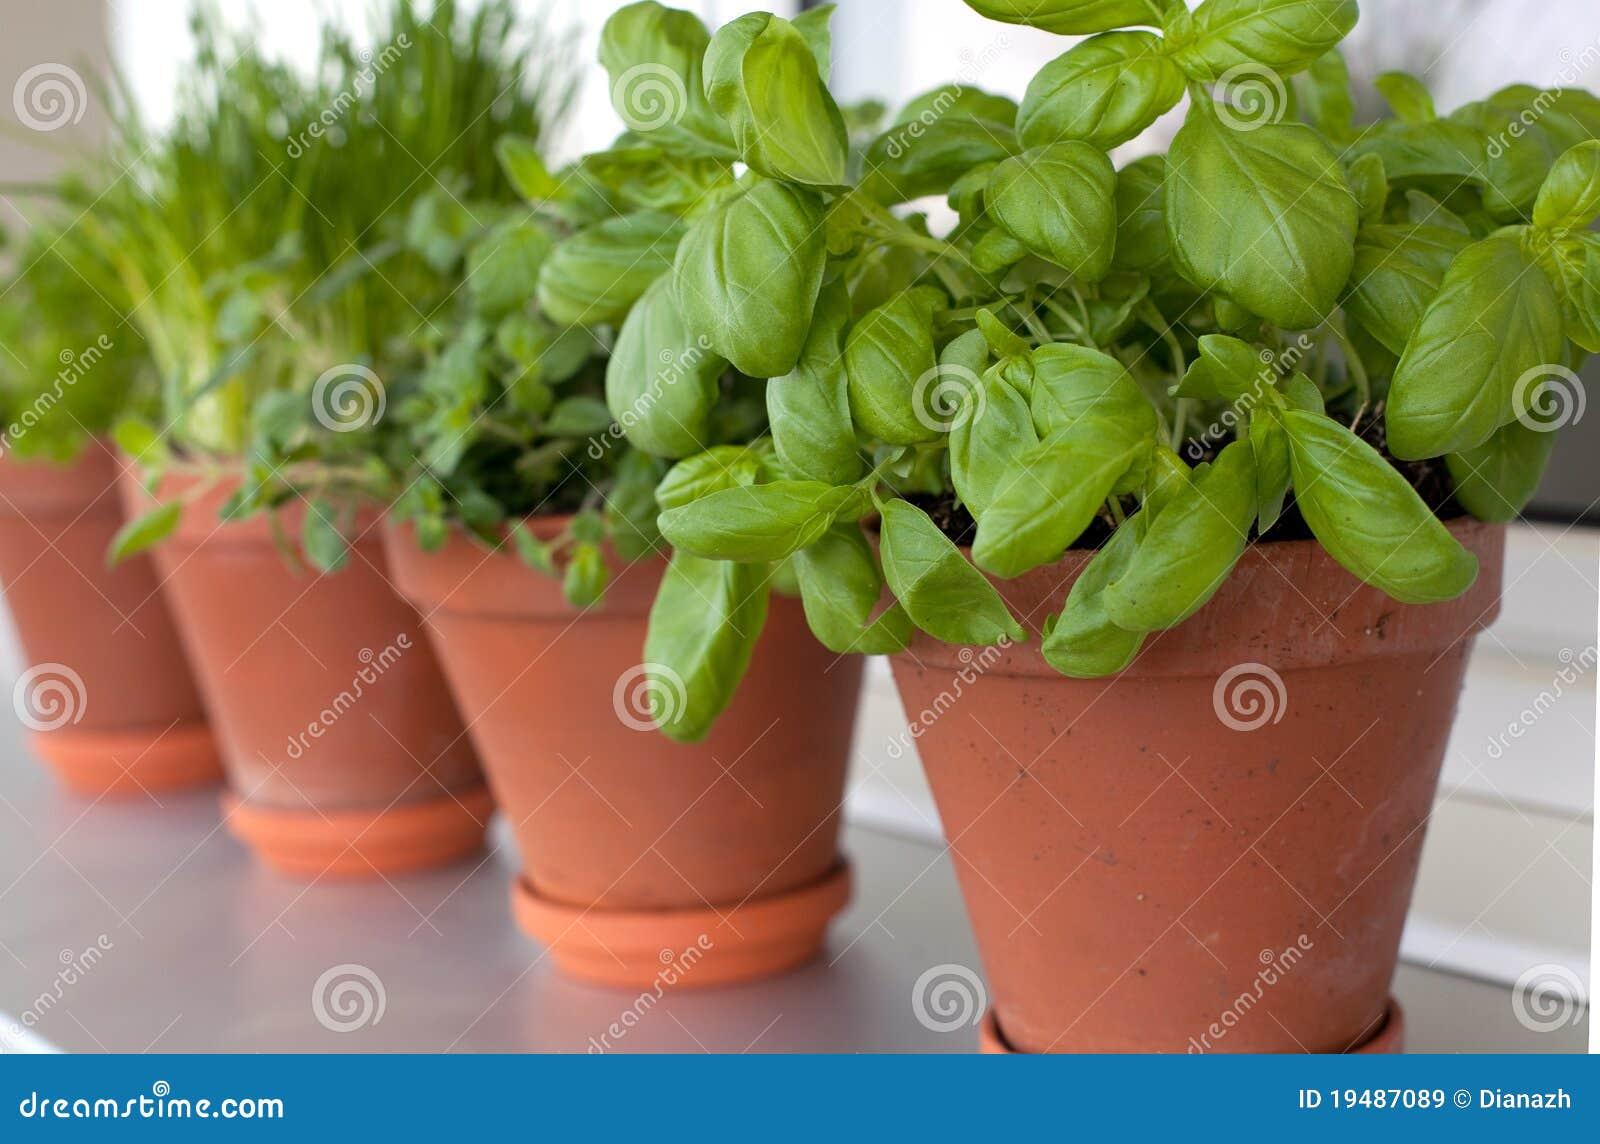 Different herbs royalty free stock image image 16265346 - Kruiden Die Op Vensterbank Groeien Royalty Vrije Stock Afbeeldingen